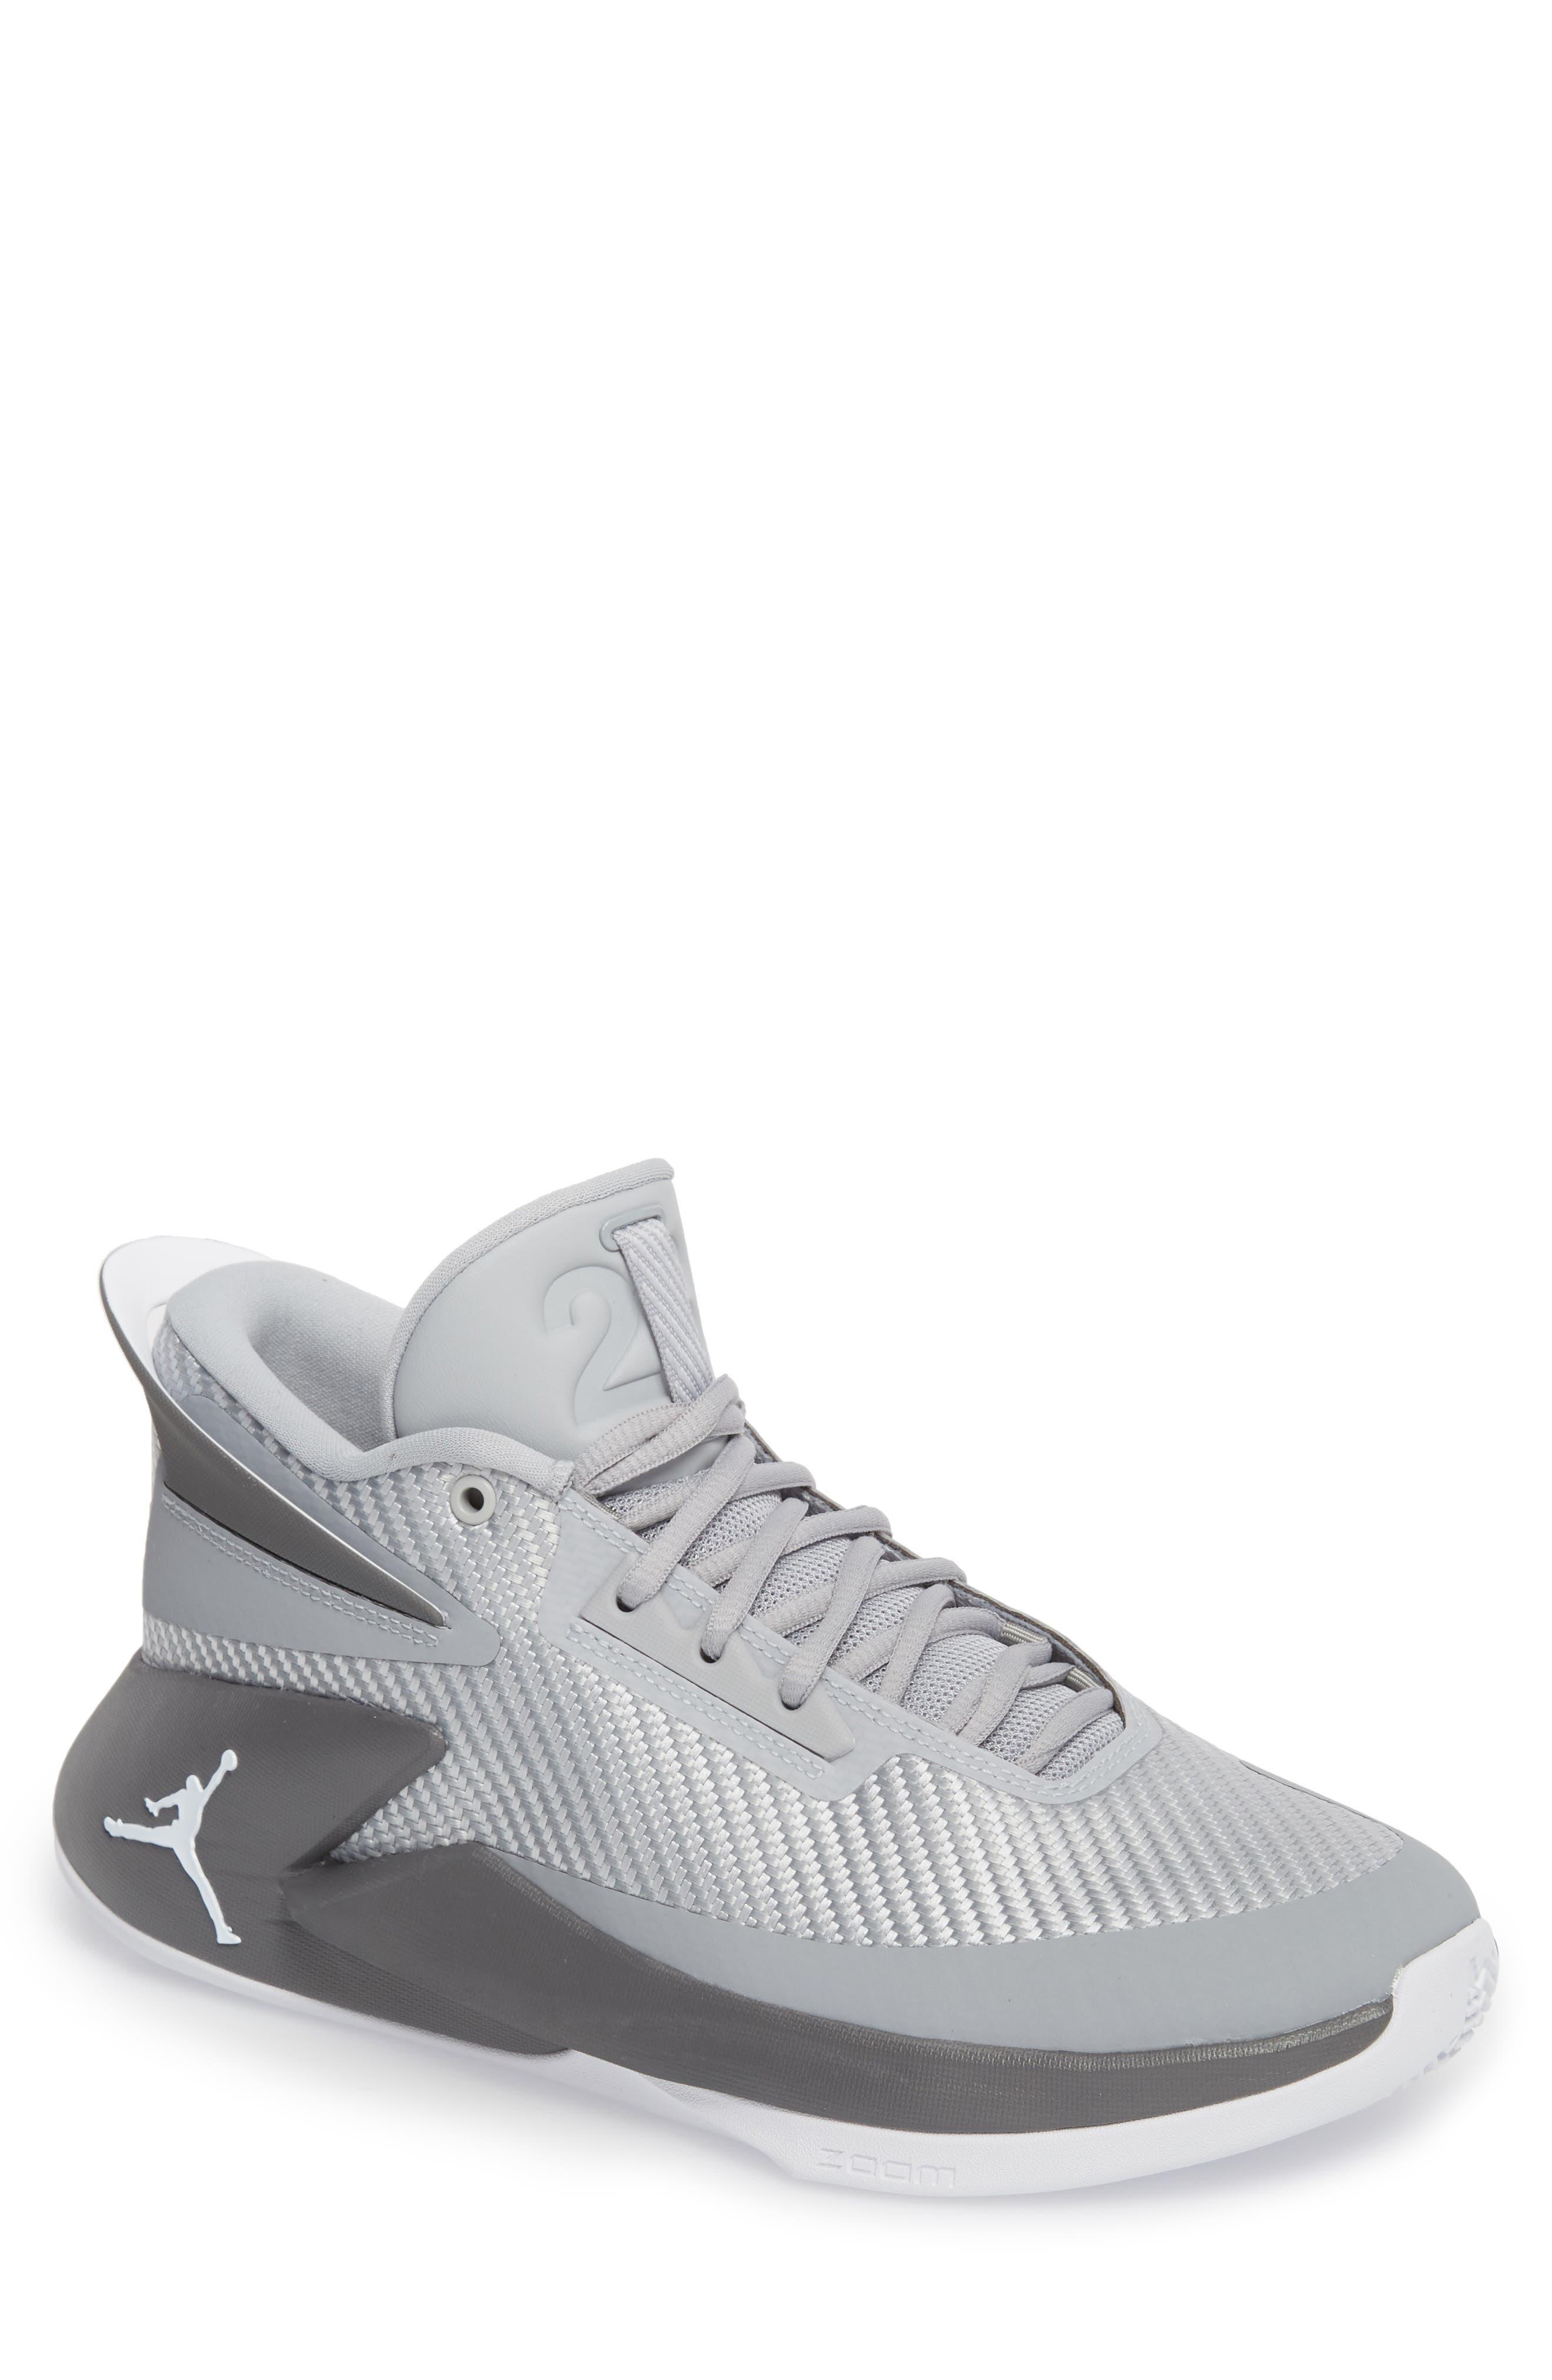 Jordan Fly Lockdown Sneaker,                             Main thumbnail 1, color,                             Wolf Grey/ White/ Dark Grey